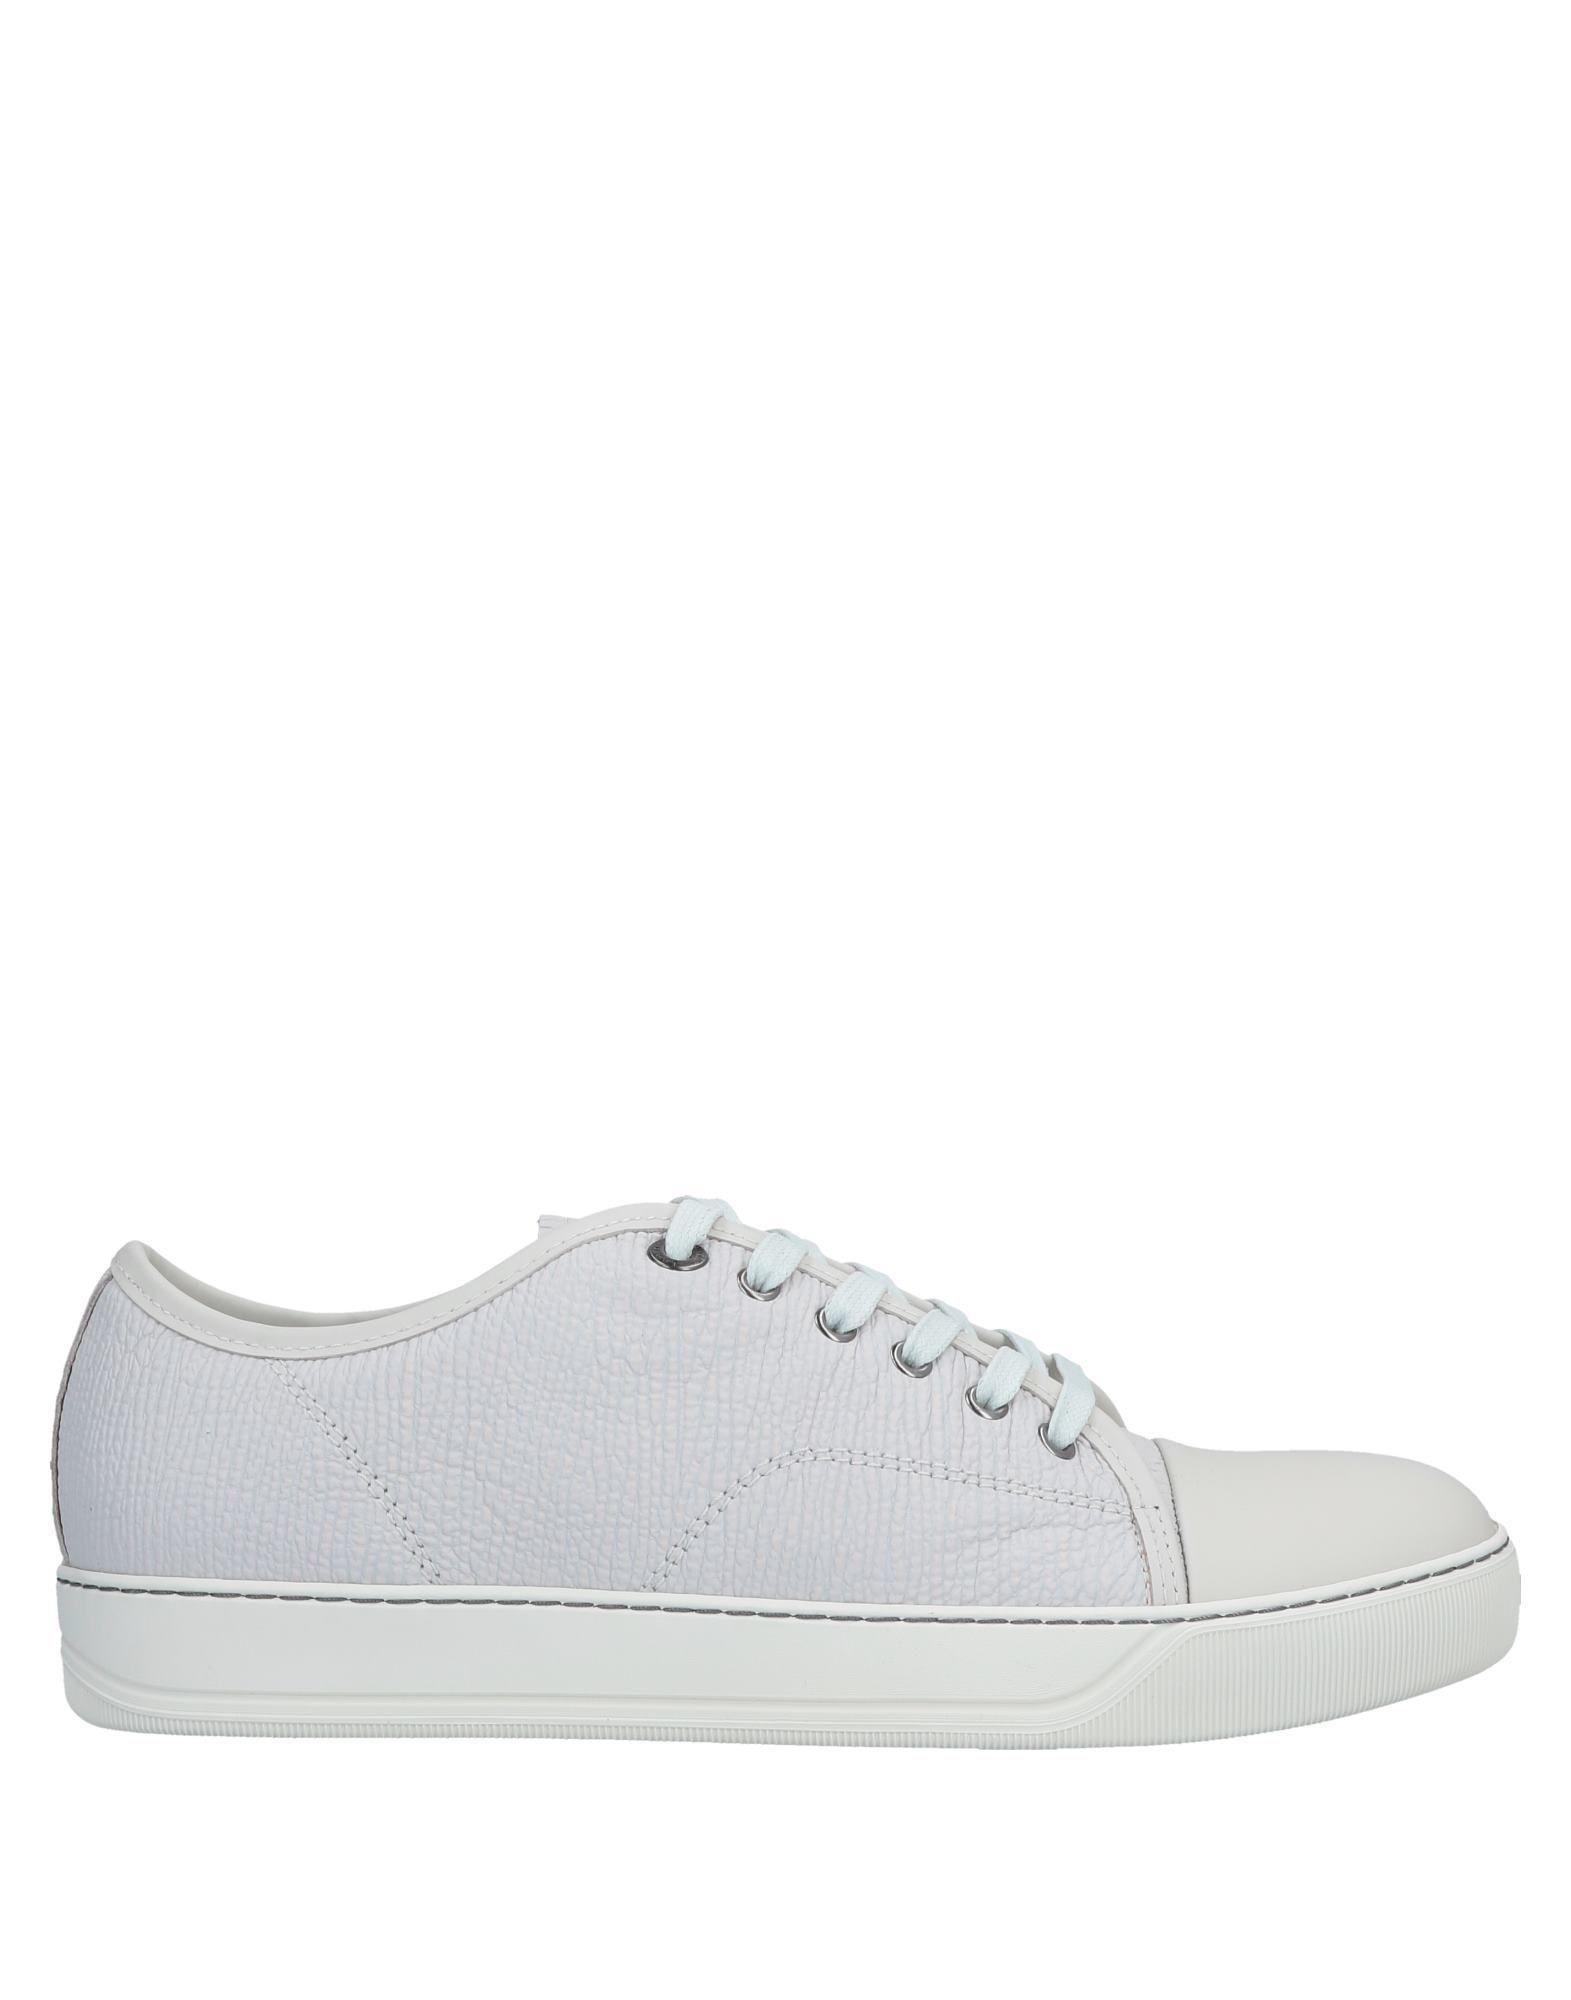 73ef4359976 Lyst - Lanvin Low-tops   Sneakers in White for Men